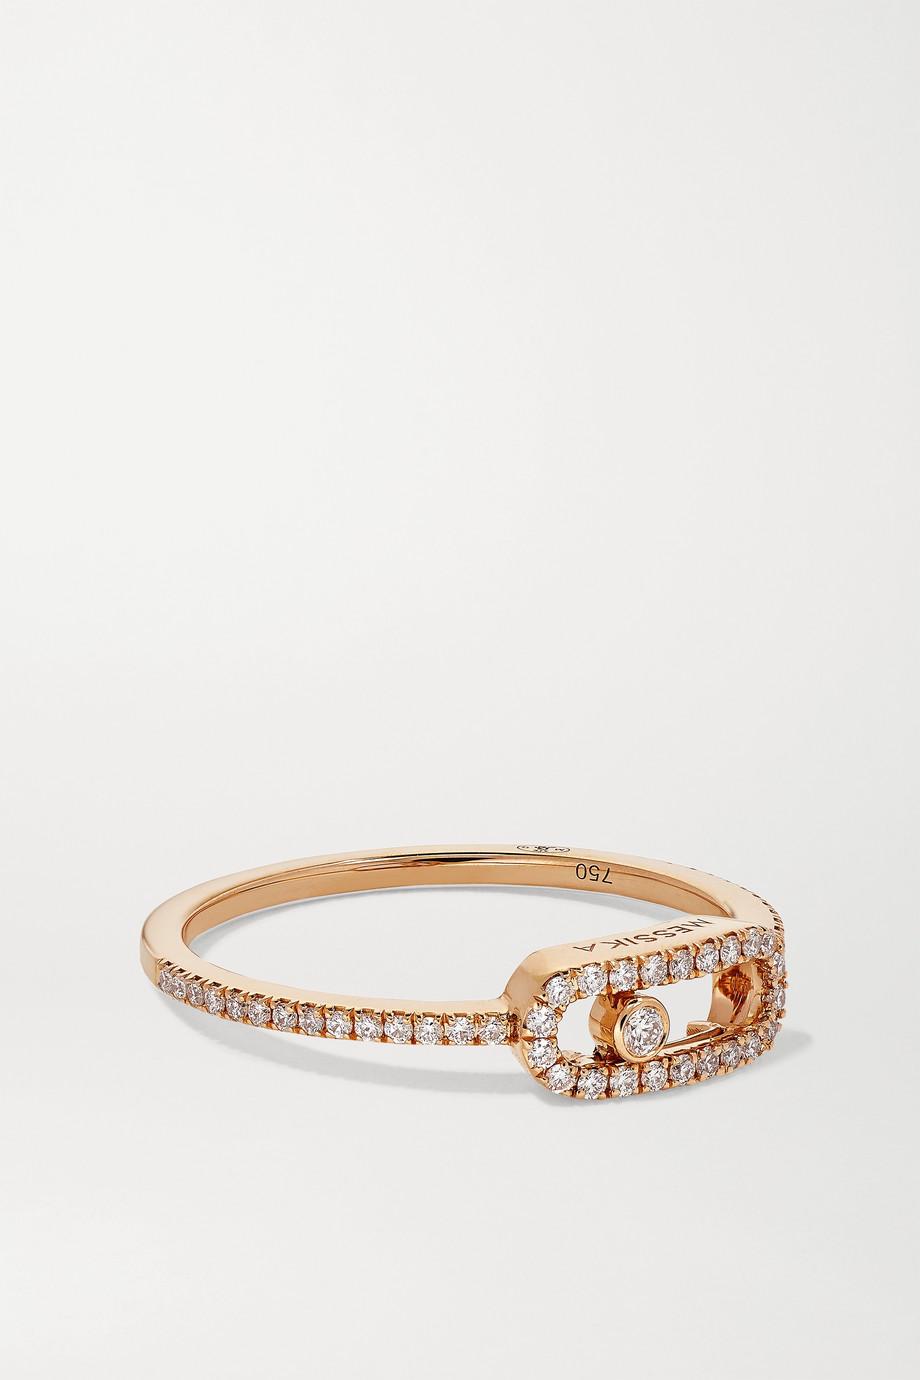 Messika Bague en or rose 18 carats (750/1000) et diamants Move Uno